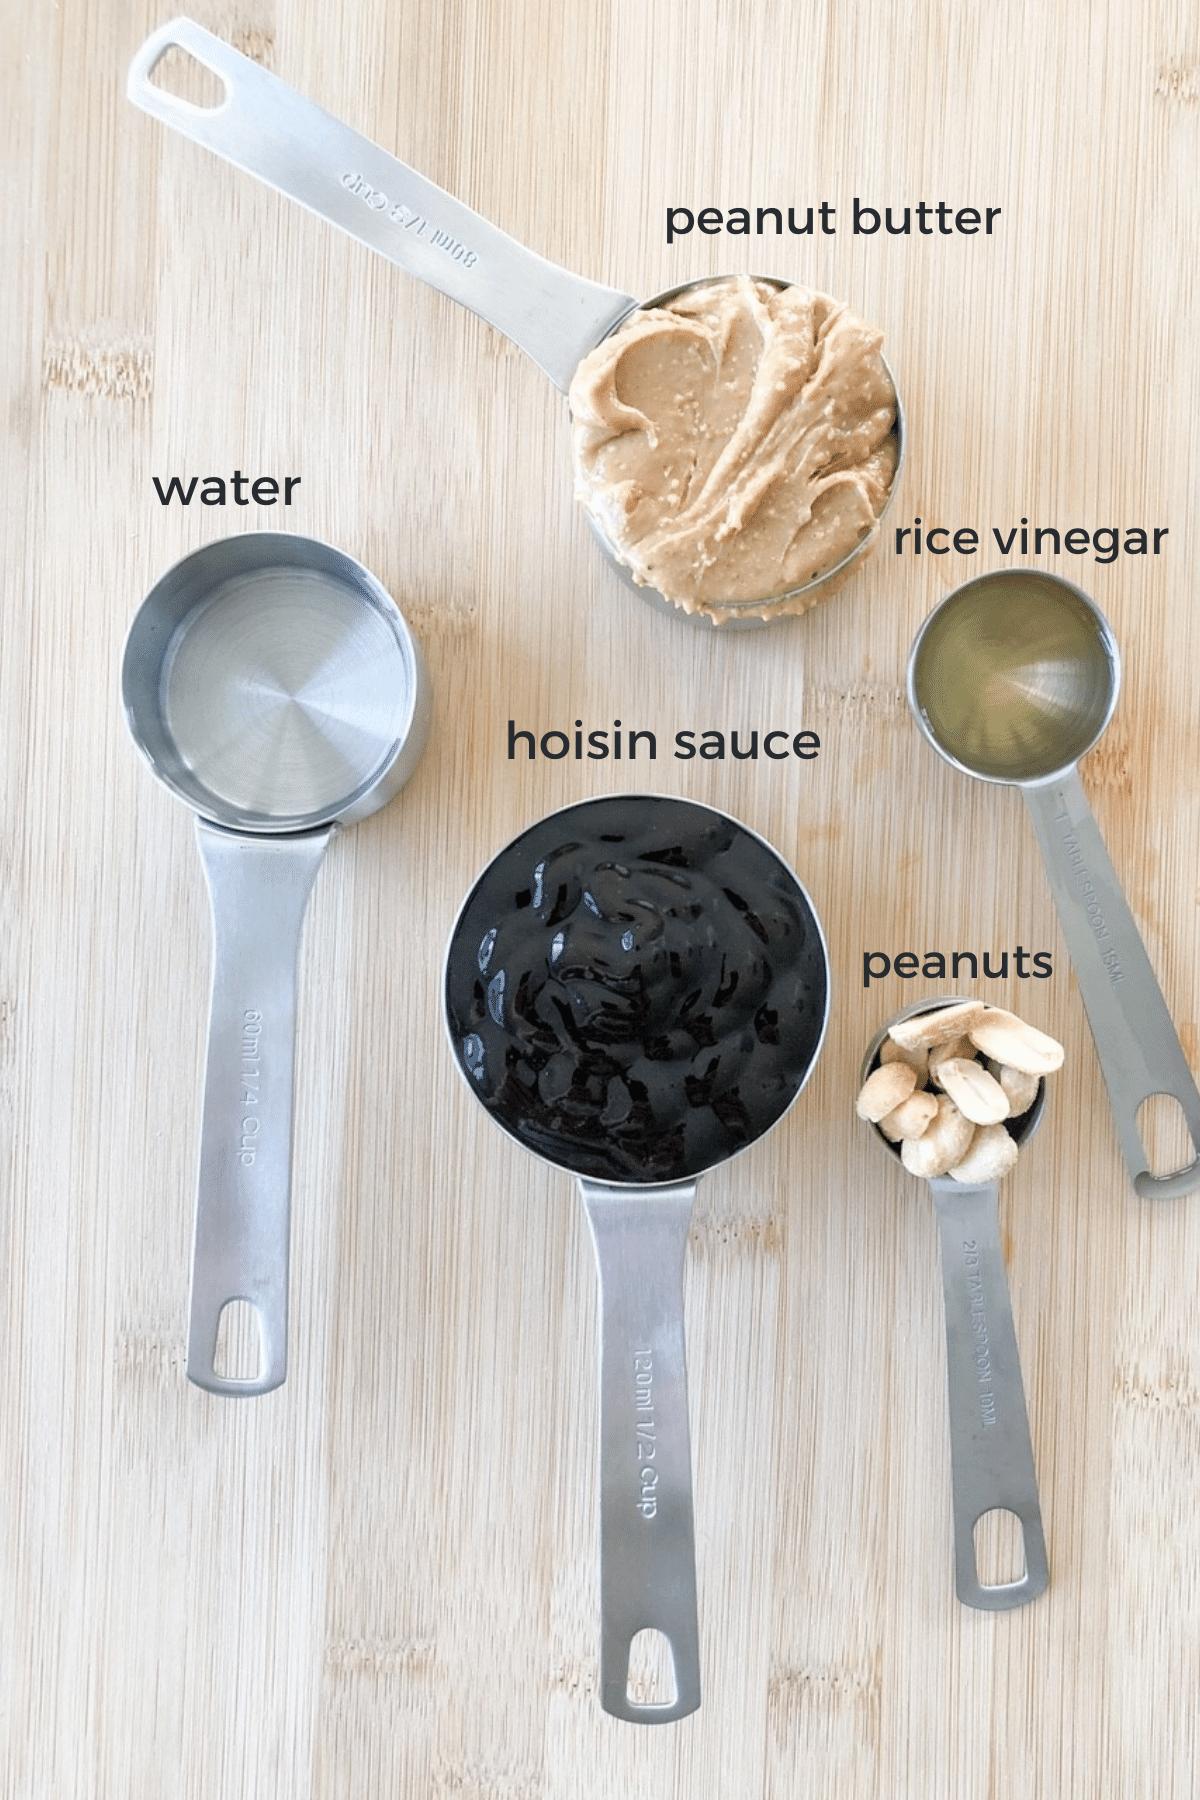 Ingredients needed to make hoisin-peanut sauce, peanut butter, hoisin sauce, water, rice vinegar, and peanuts